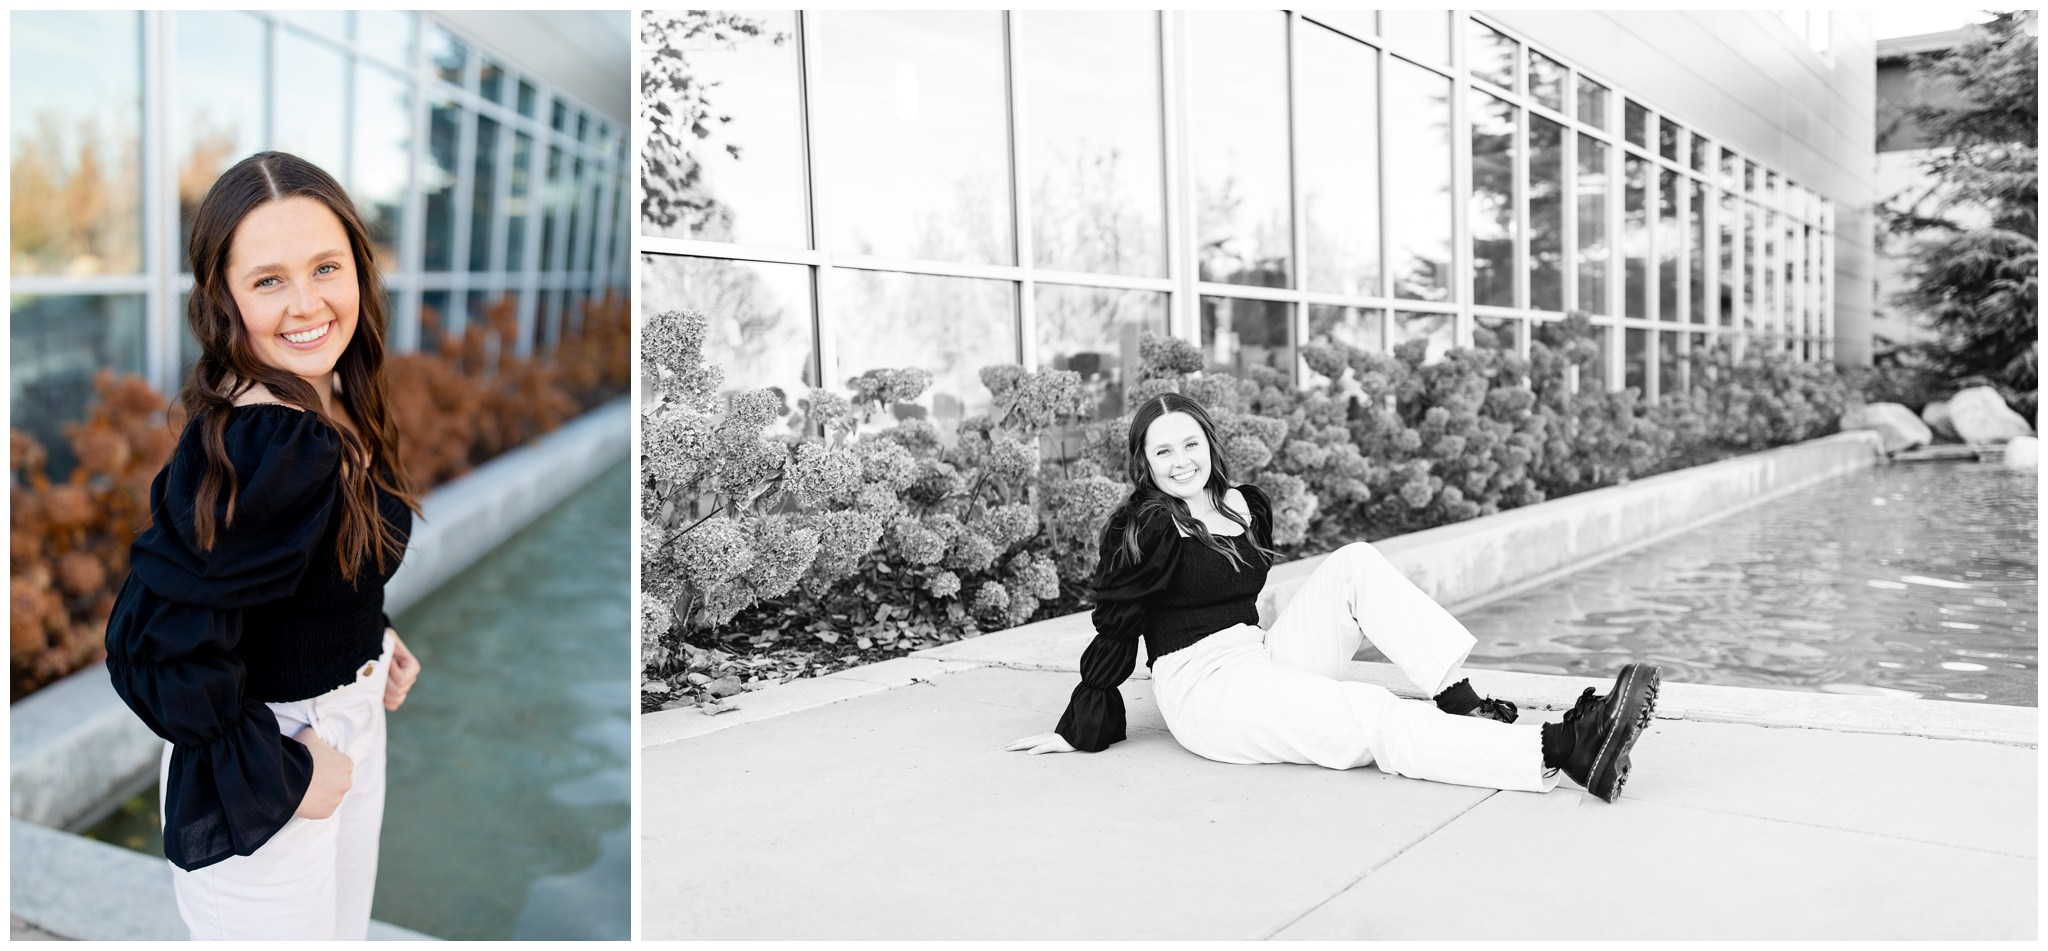 Senior girl posing for high school pictures in Rexburg, Idaho